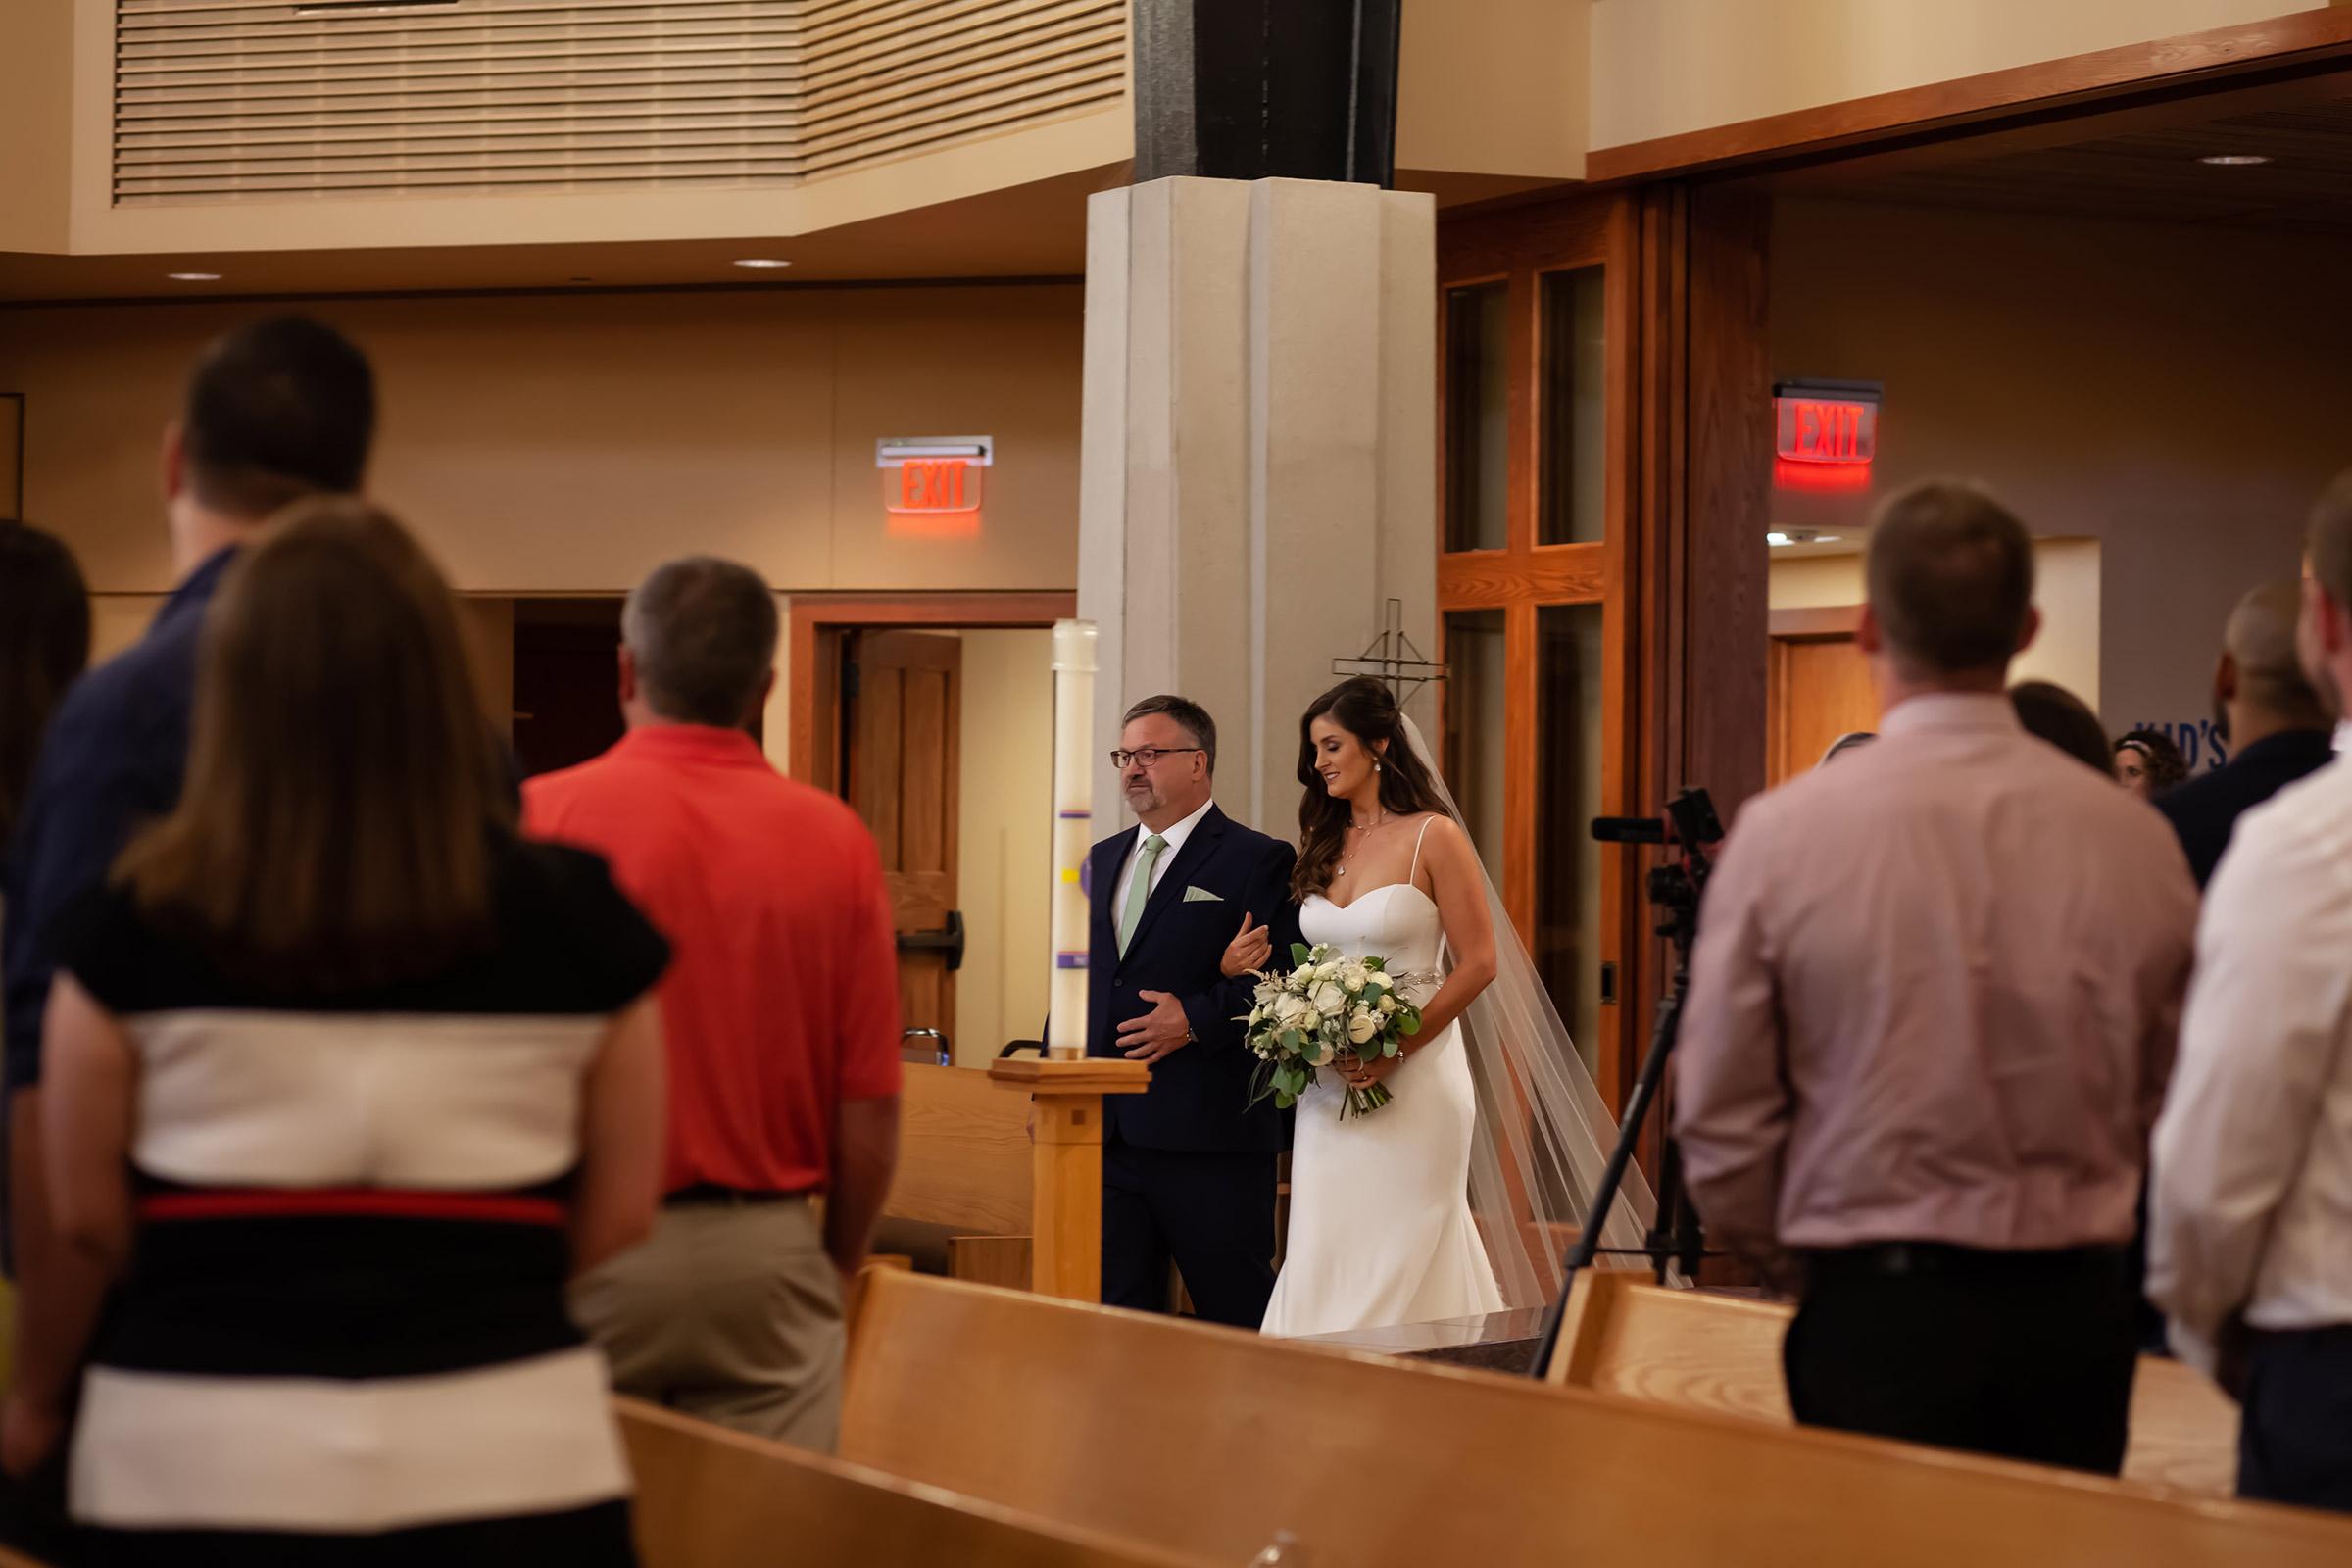 mr-mrs-hull-dad-walking-bride-down-aisle-st-boniface-church-waukee-desmoines-iowa-raelyn-ramey-photography-317.jpg